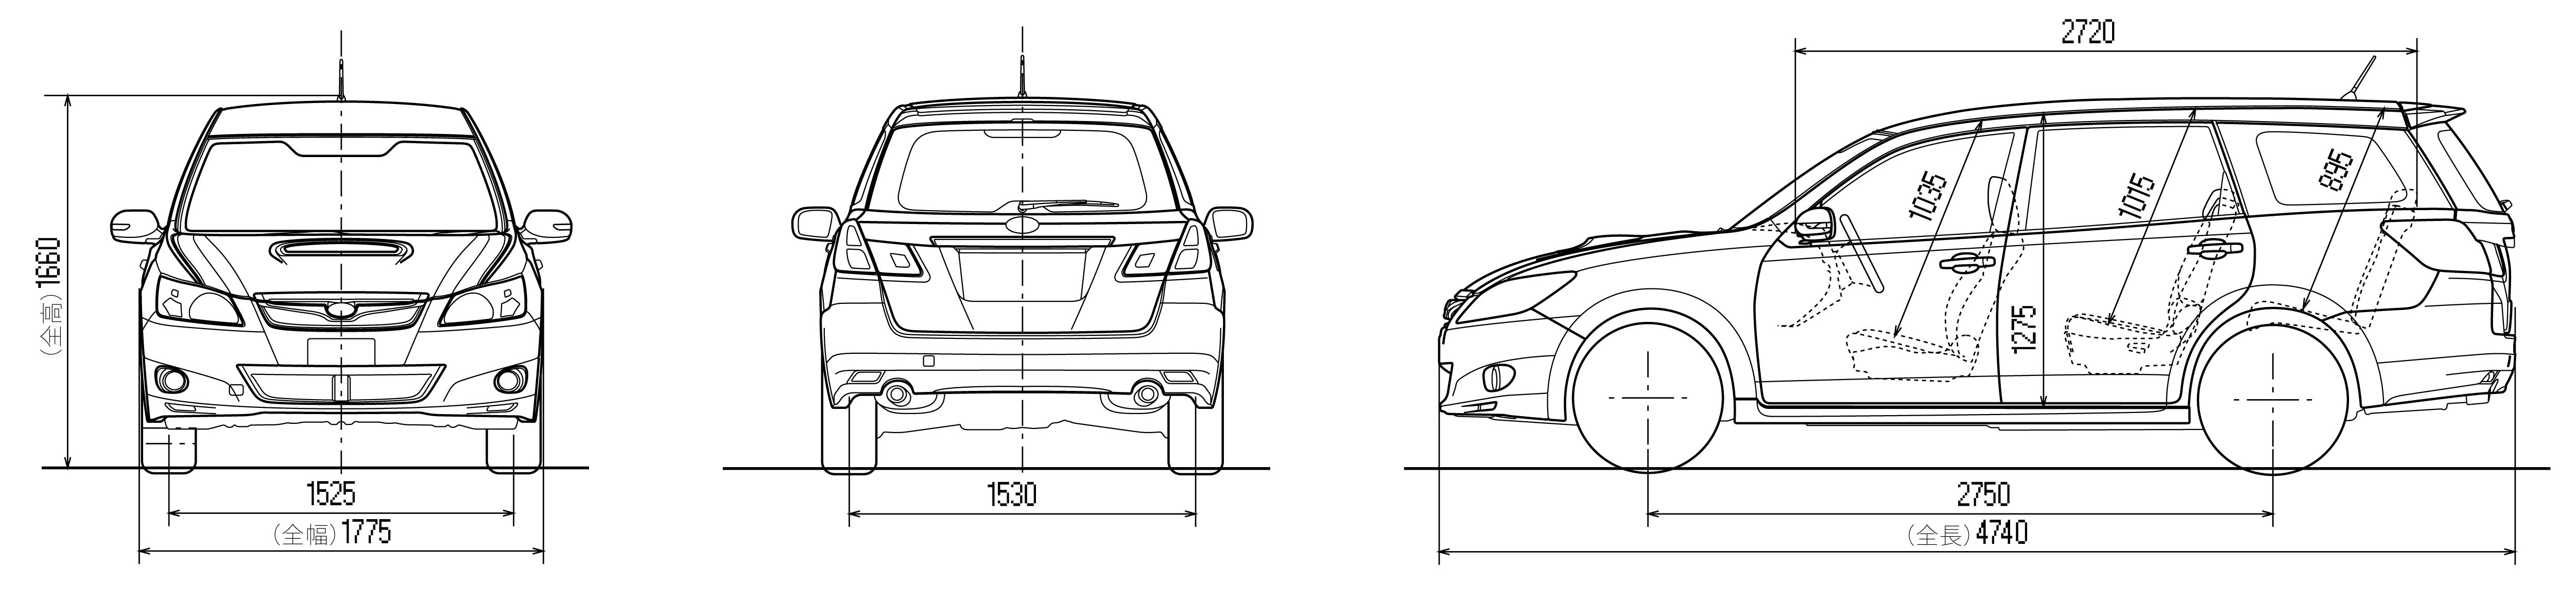 Subaru Exiga blueprint